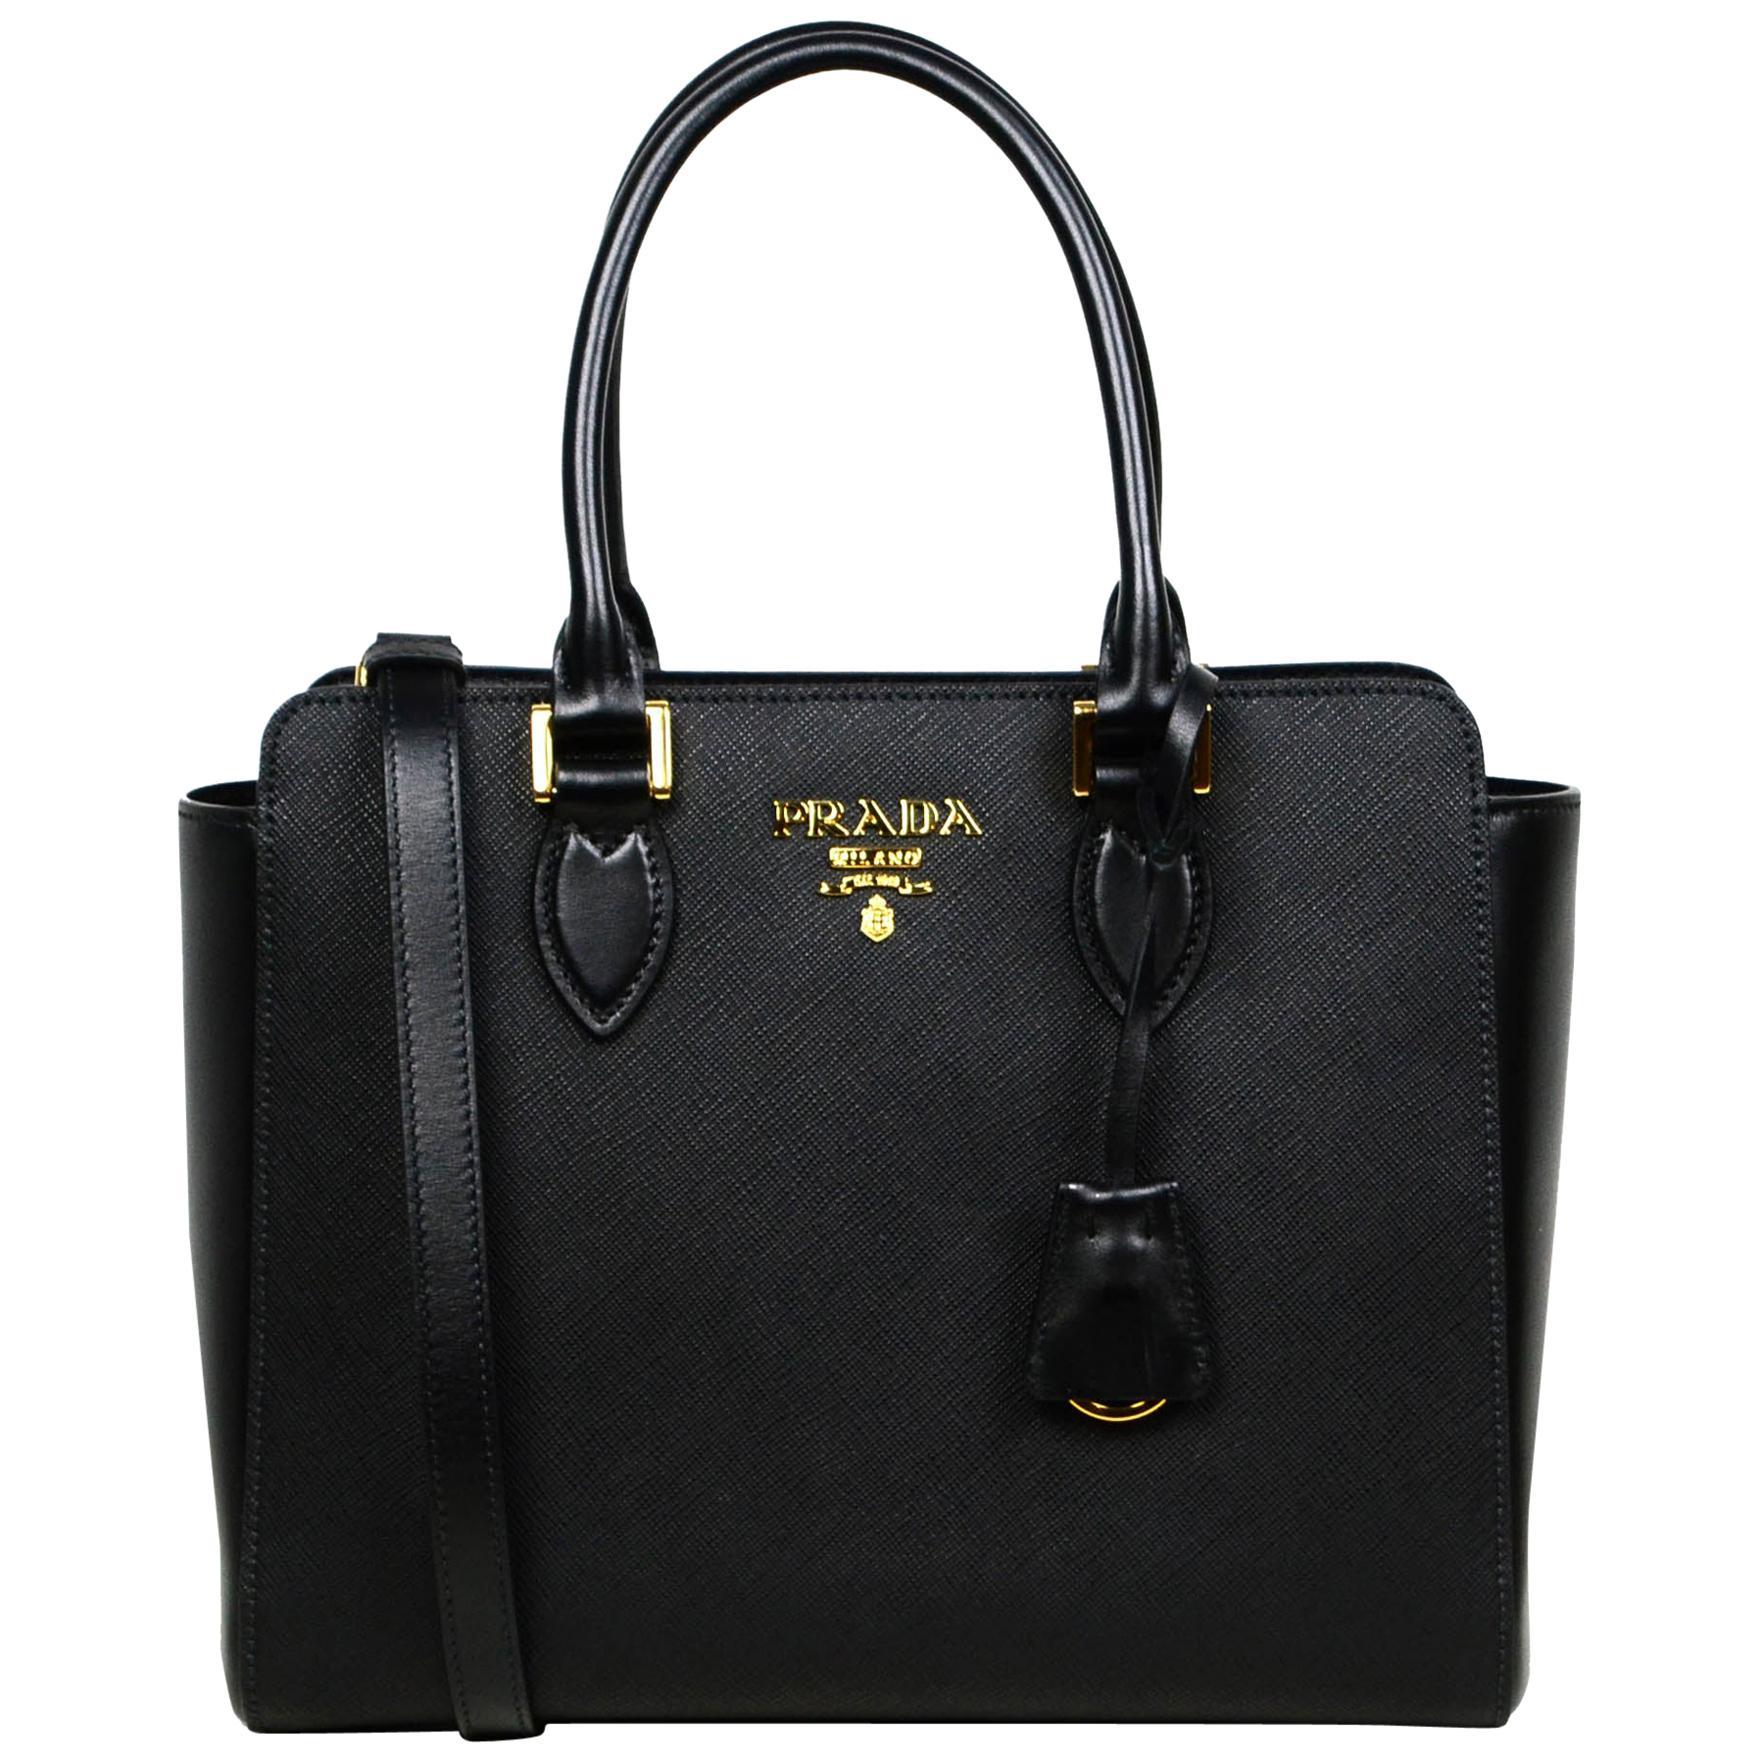 Prada Nero Black Saffiano Small Top Handle Tote Crossbody Bag 1BA113